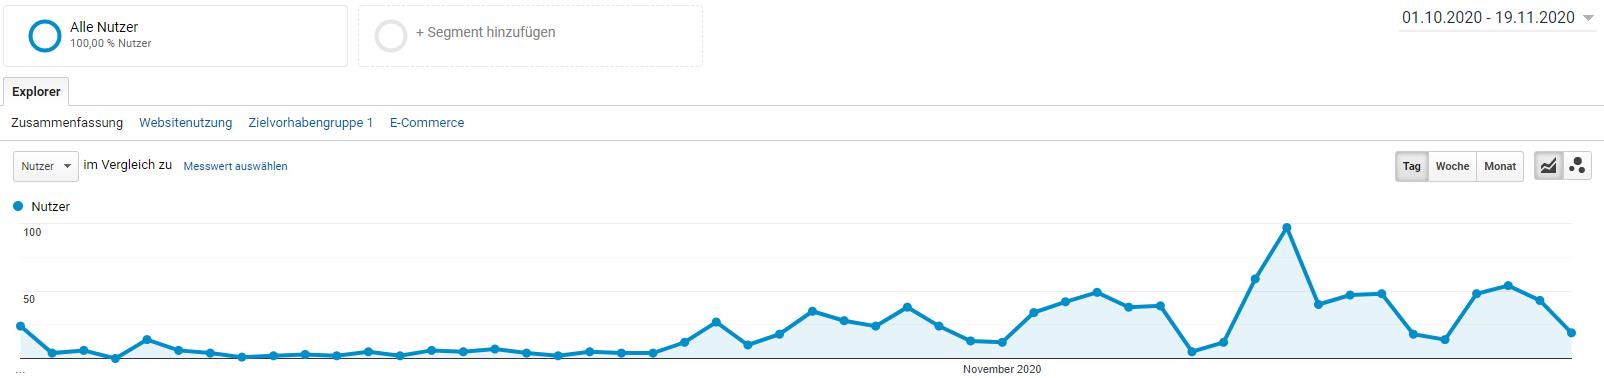 Google Analytics - Oktober bis November